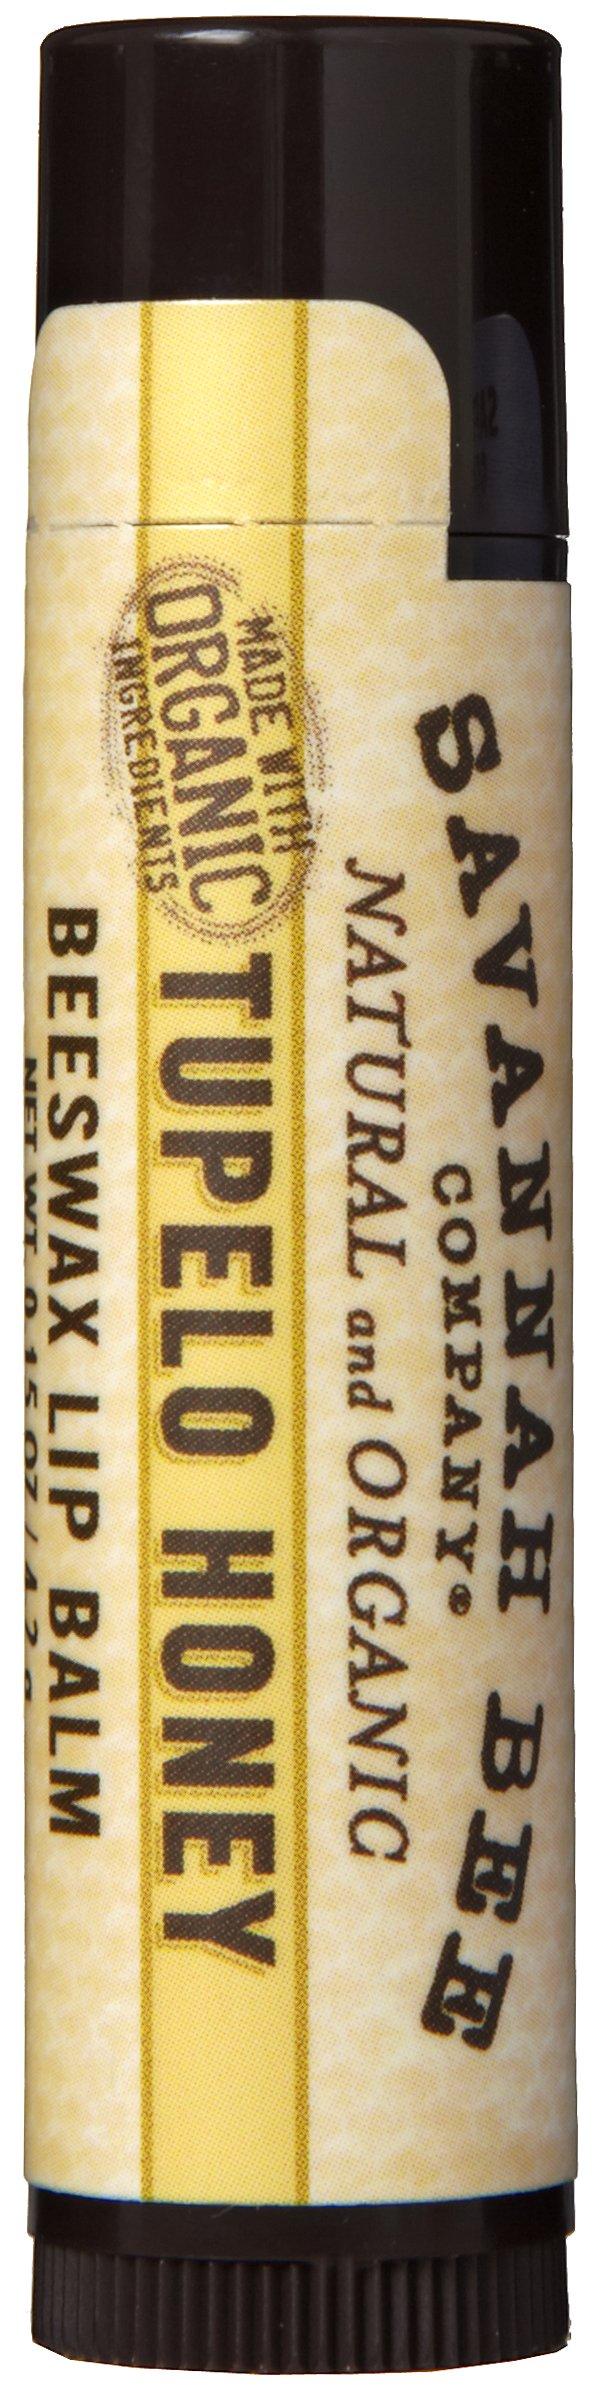 Savannah Bee Company Natural and Organic Tupelo Honey Beeswax Lip Balm, 0.15-Ounce (Pack of 4)